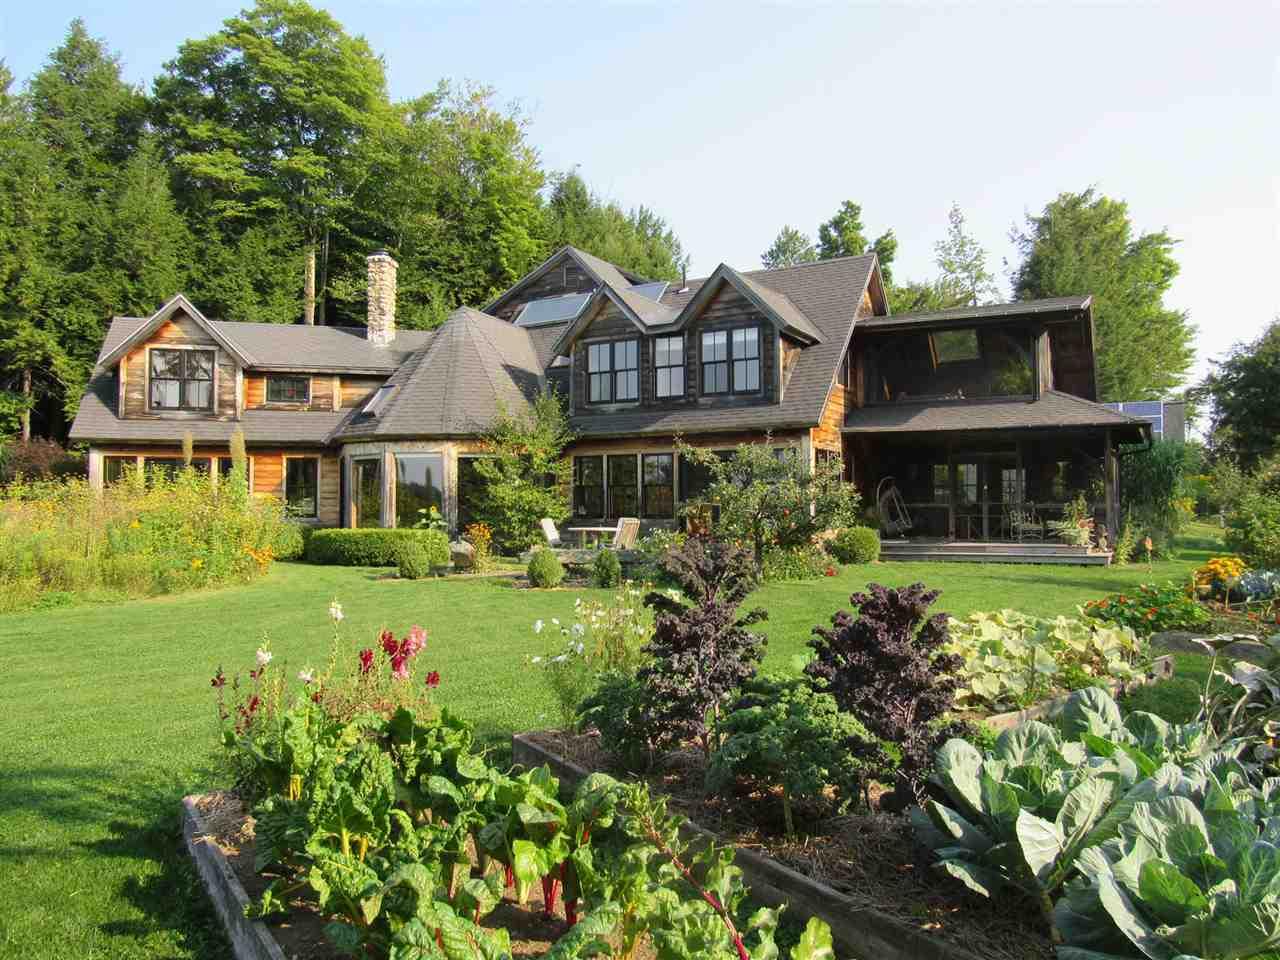 Mount-Snow-Real-Estate-4634670-0